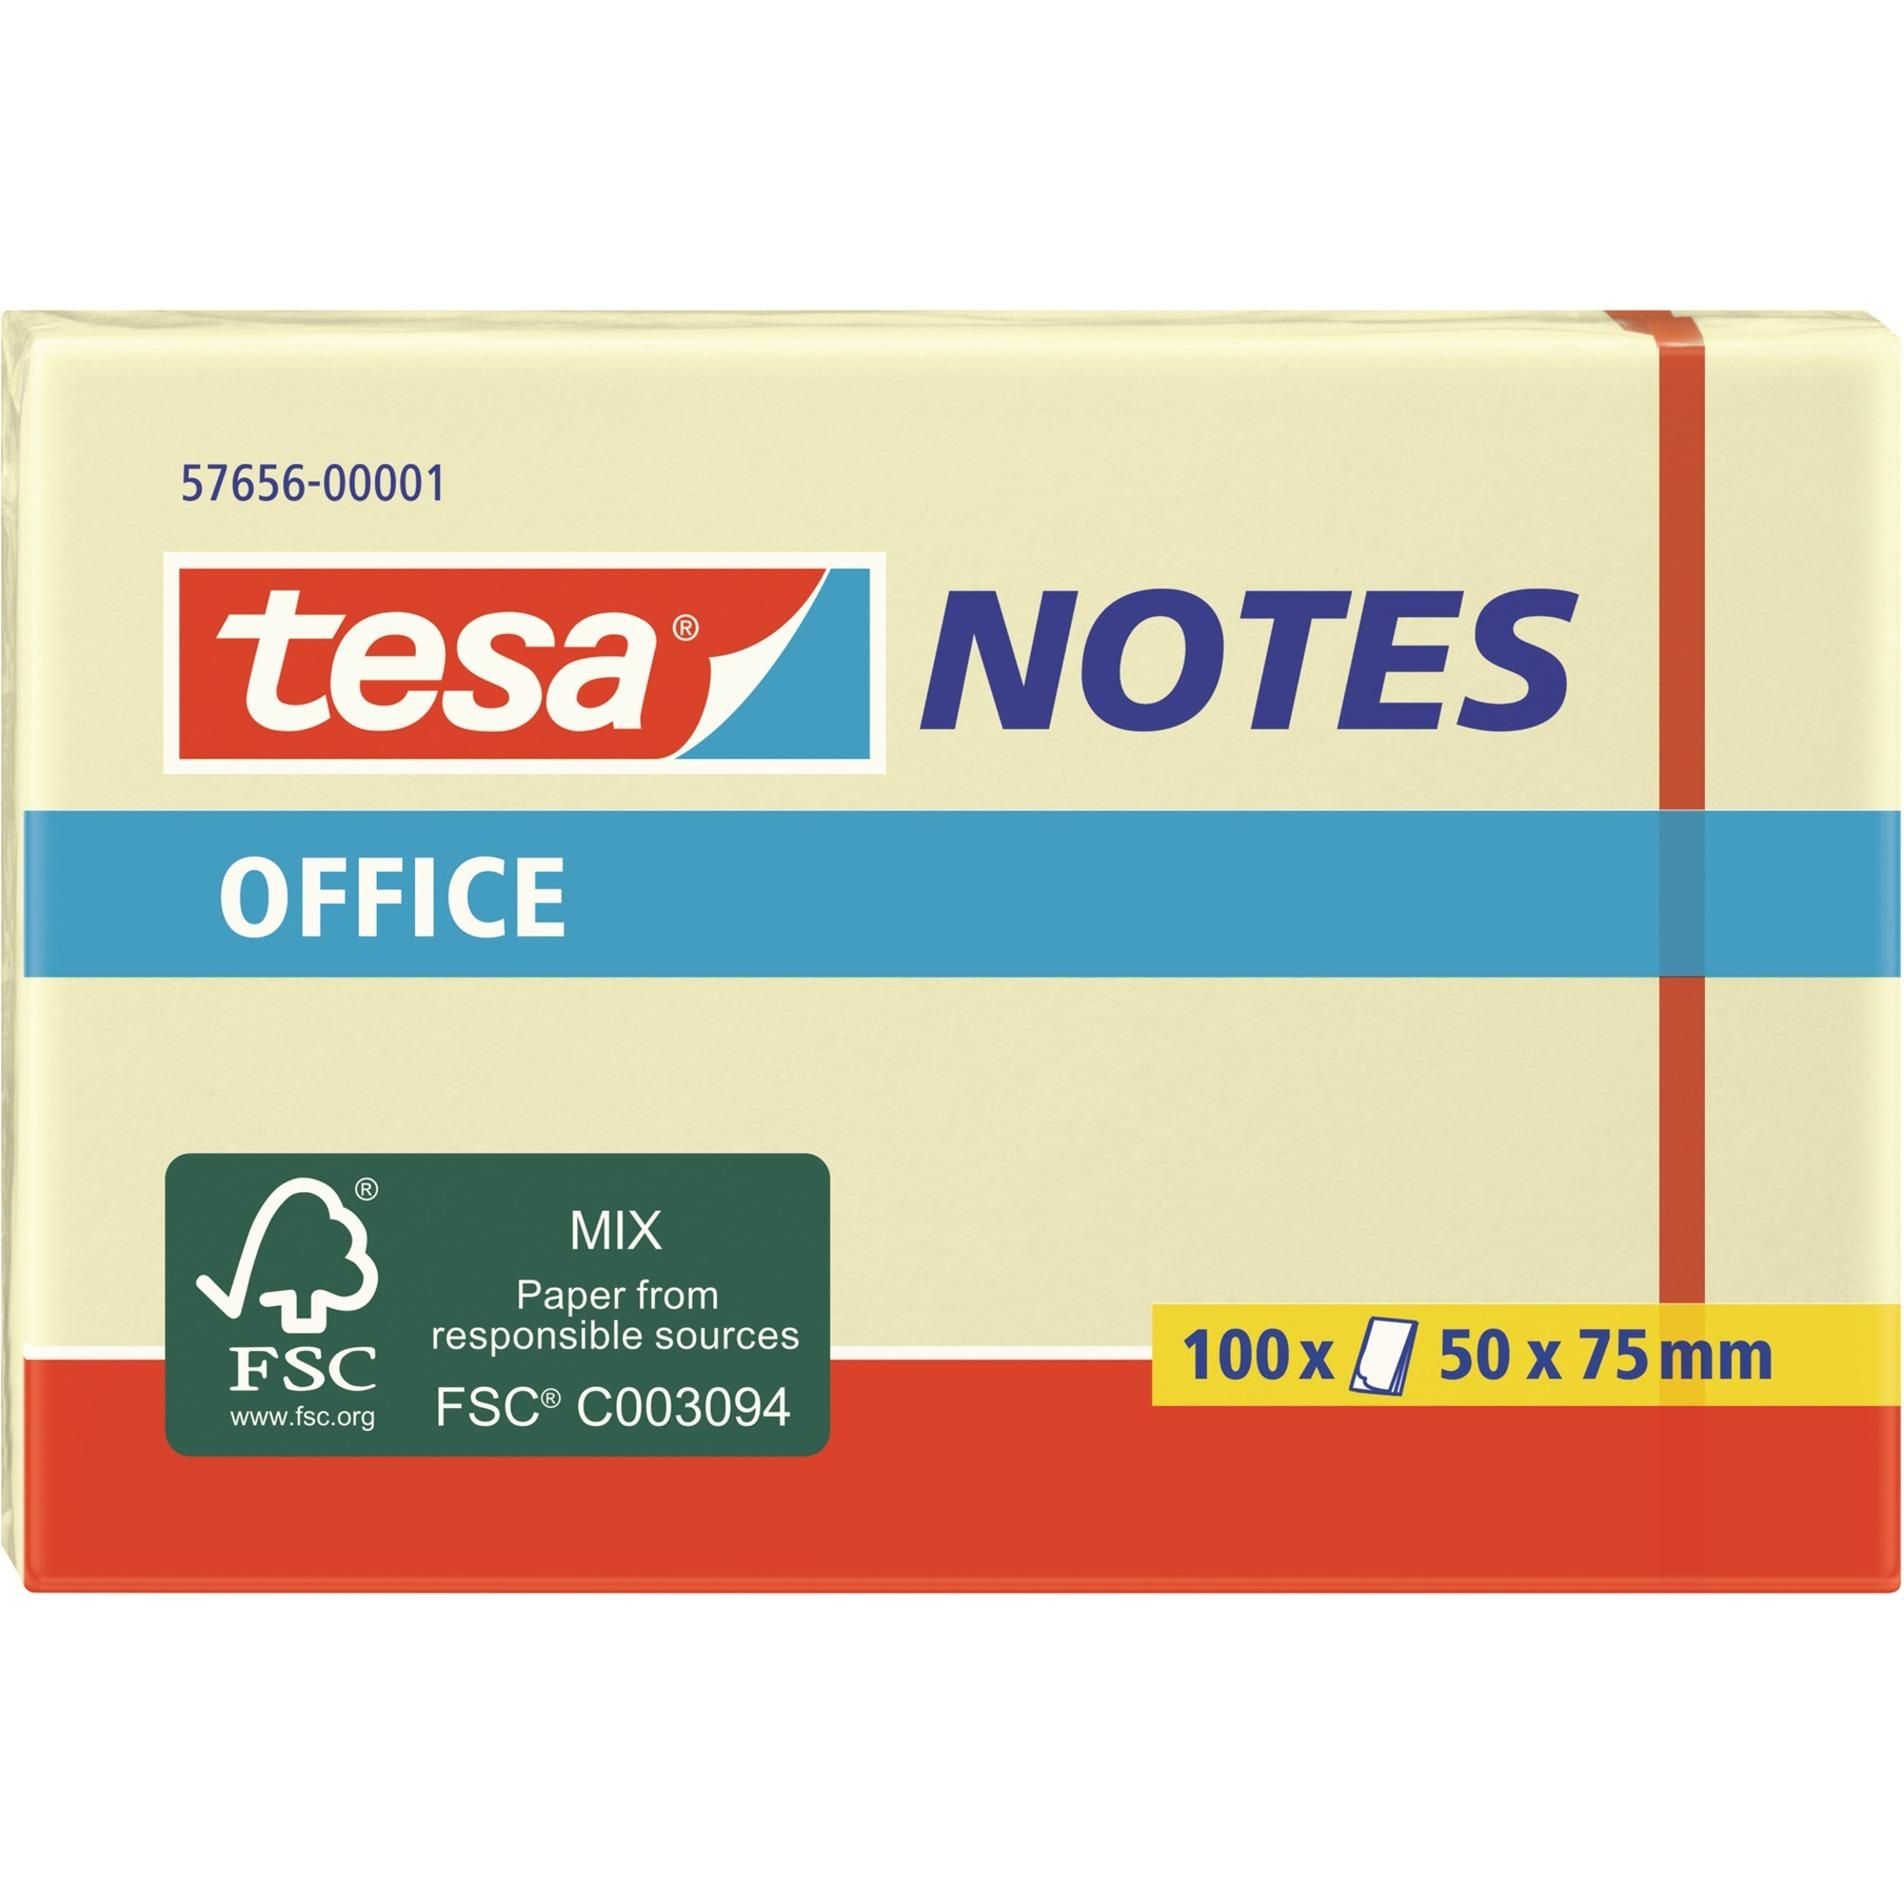 Image of Office Notes, 100 Blatt, Aufkleber